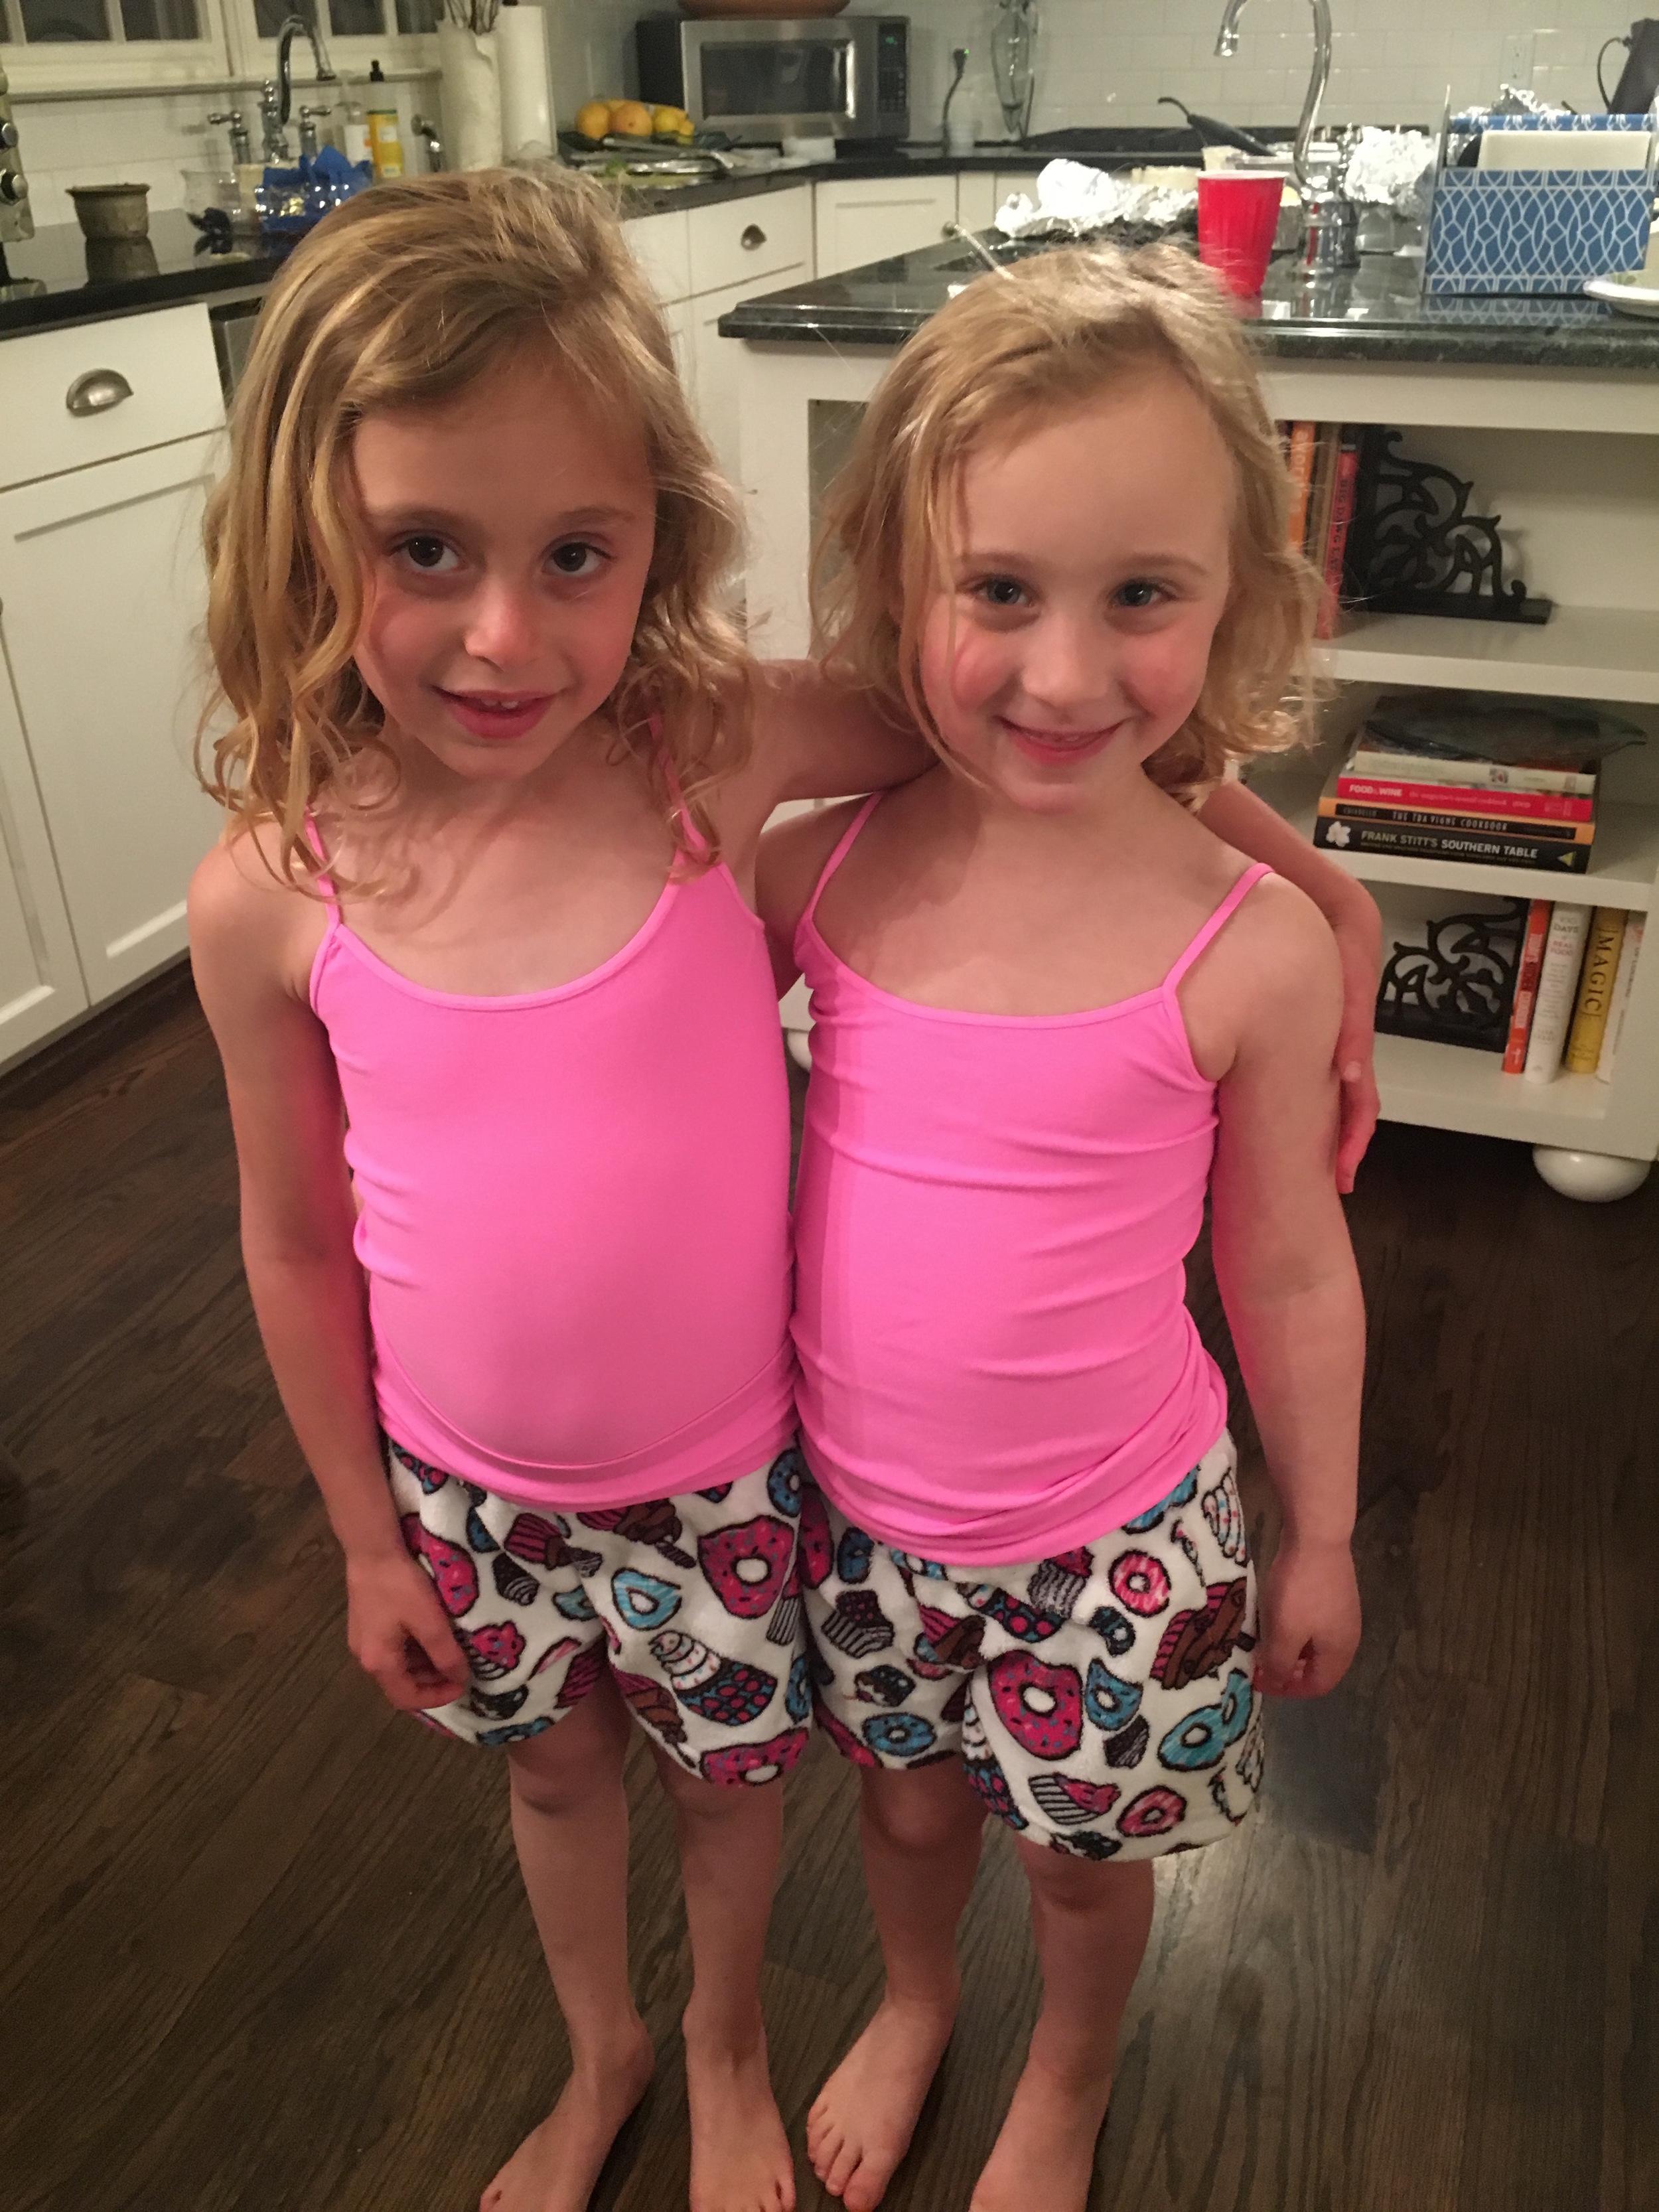 Alexa & Alexa Bond Over Matching PJs.